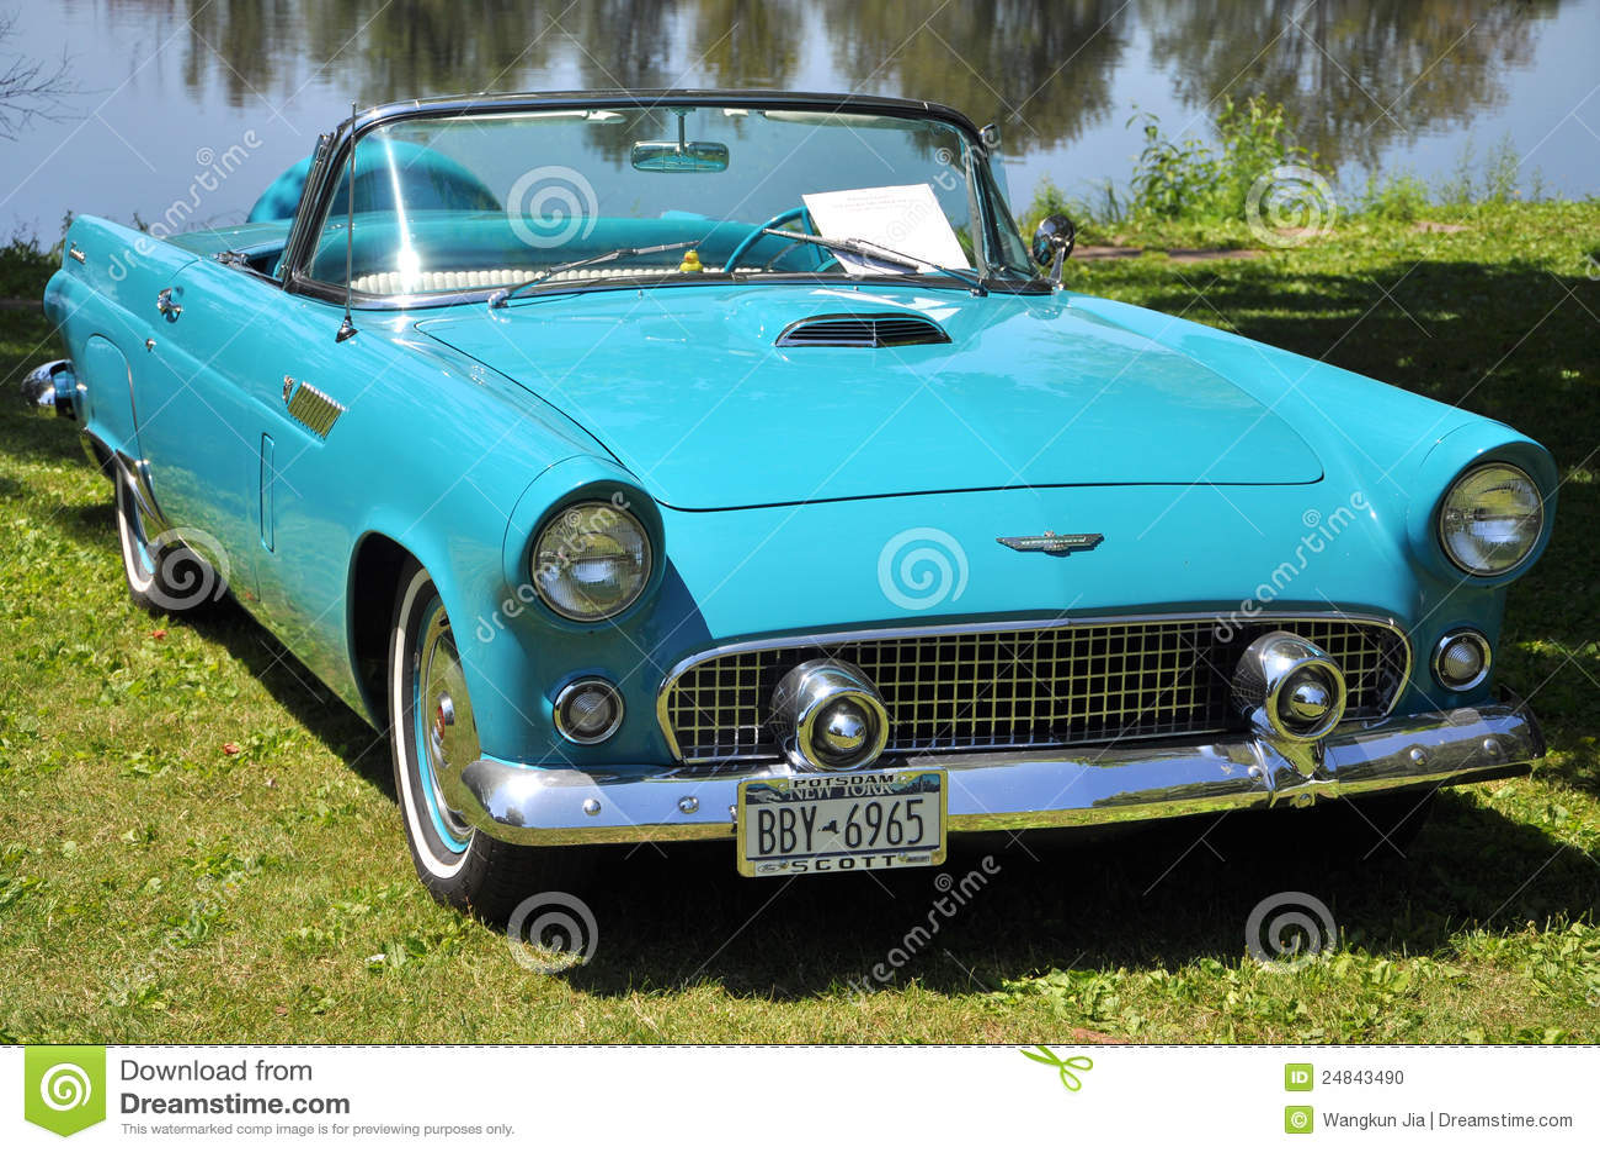 Ford 1956 Thunderbird